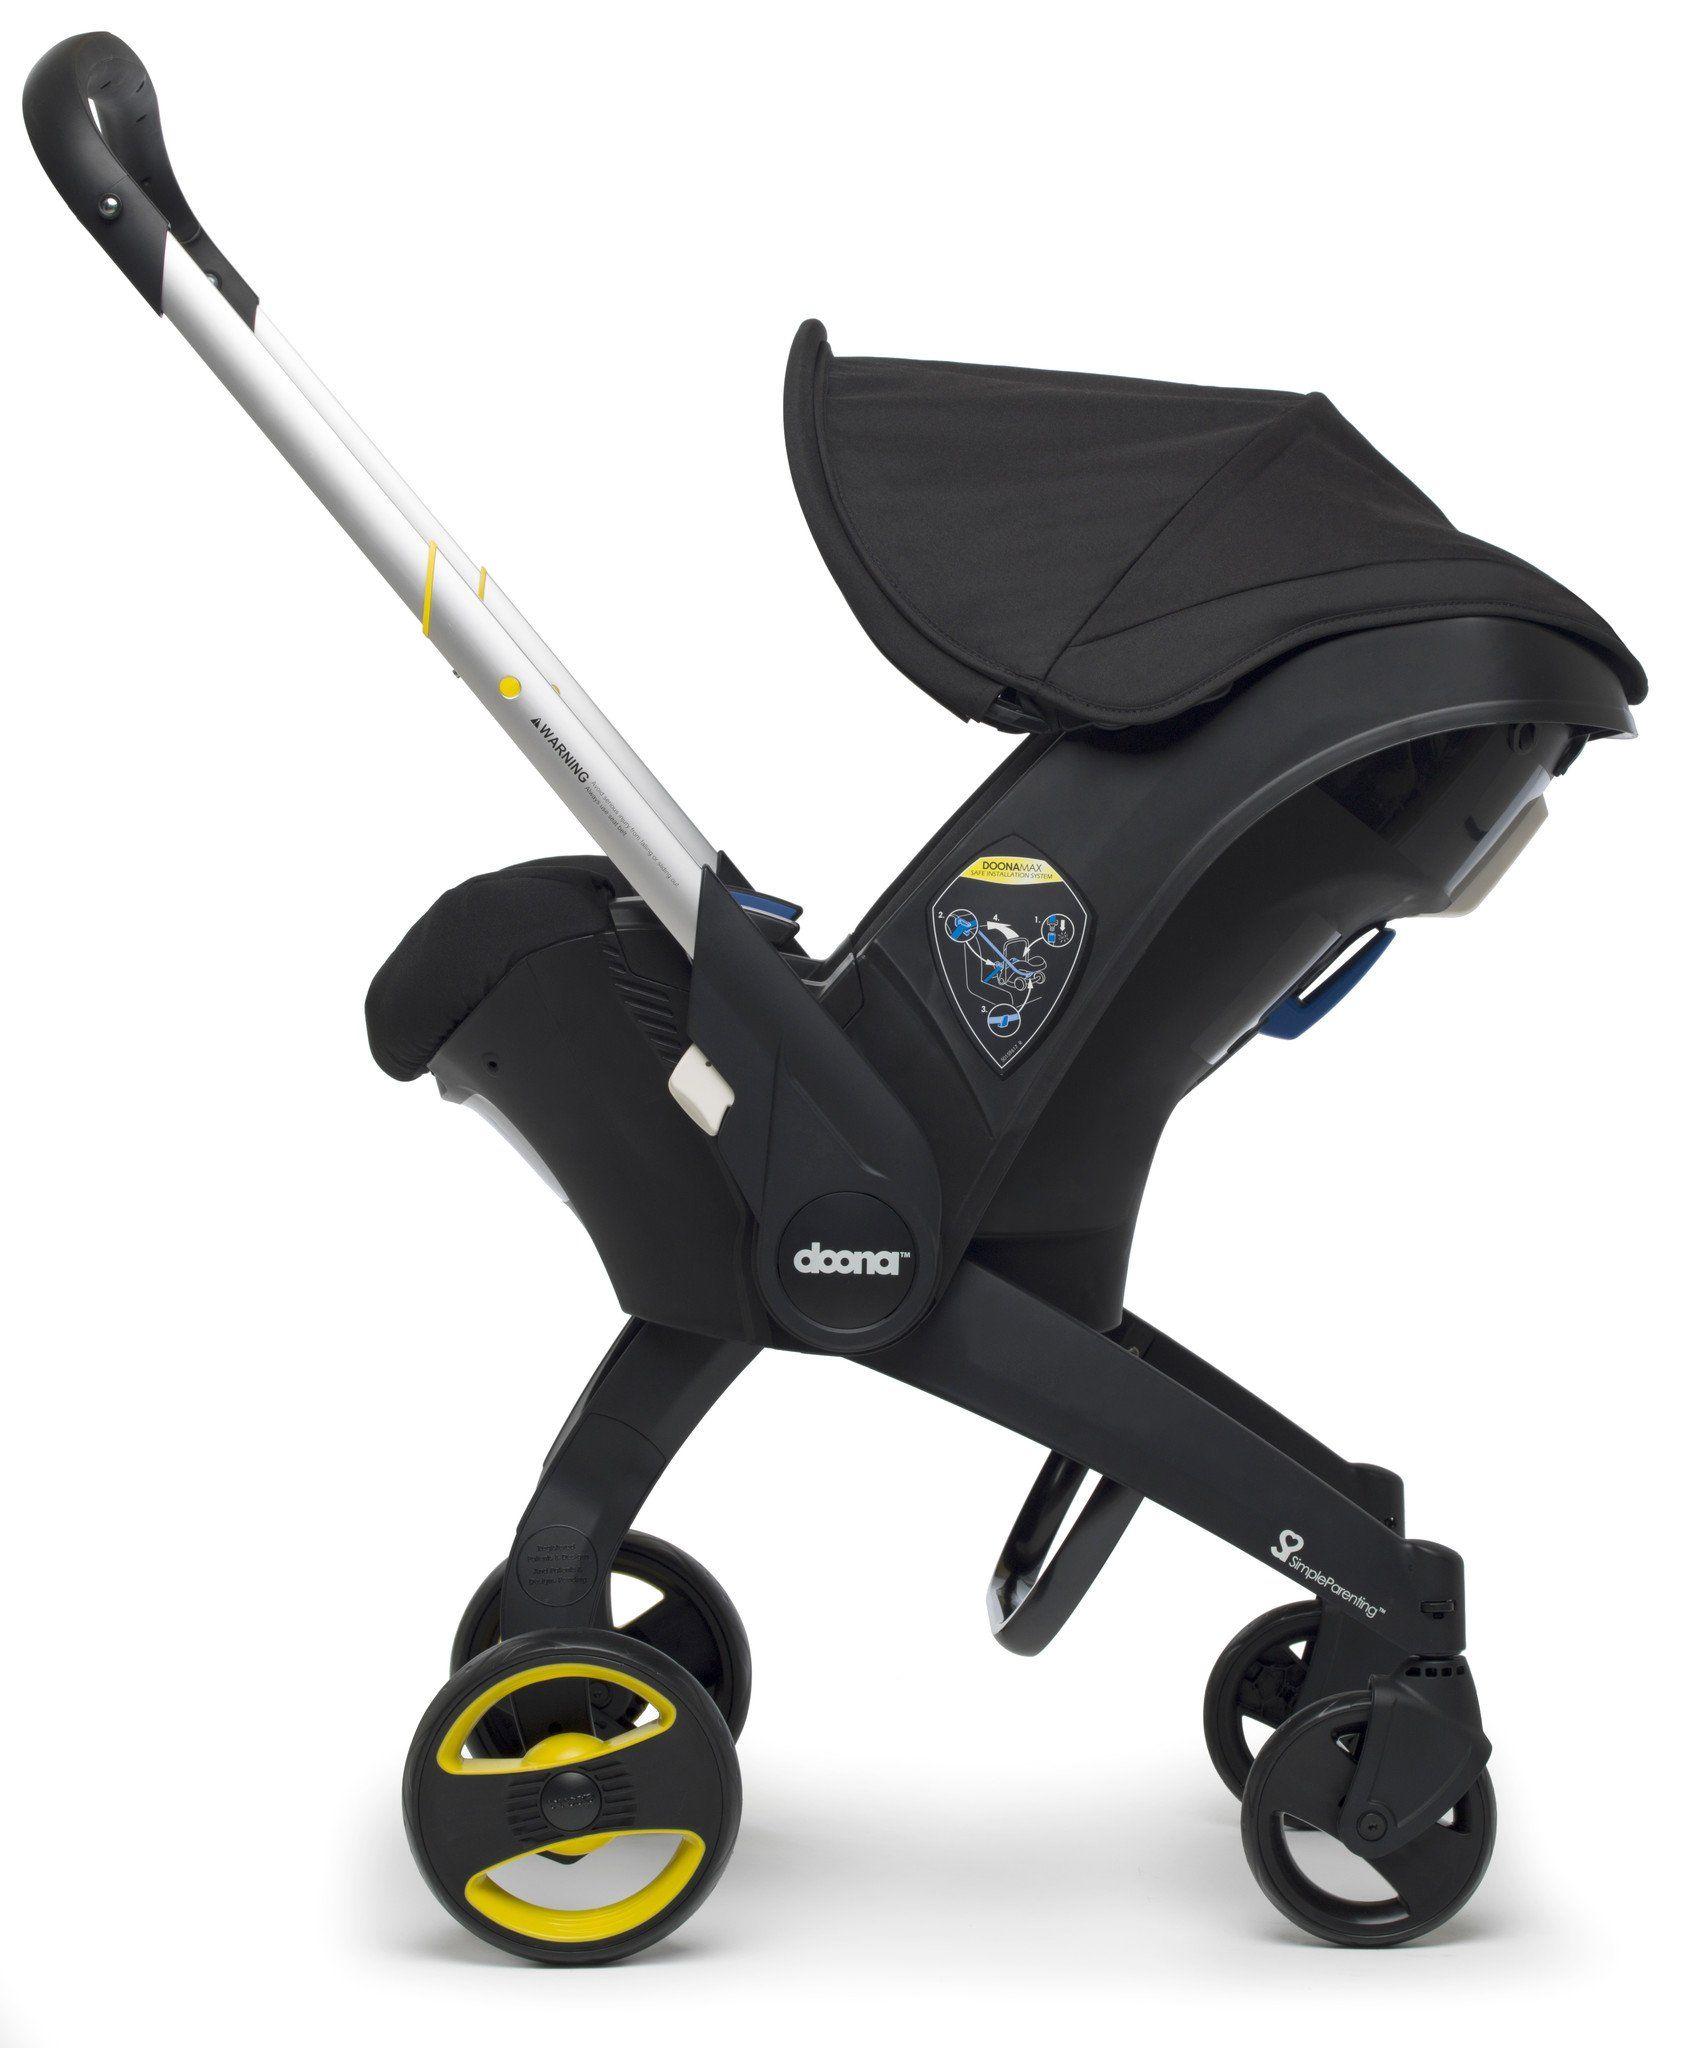 Doona Car Seat Stroller Baby car seats, Doona car seat